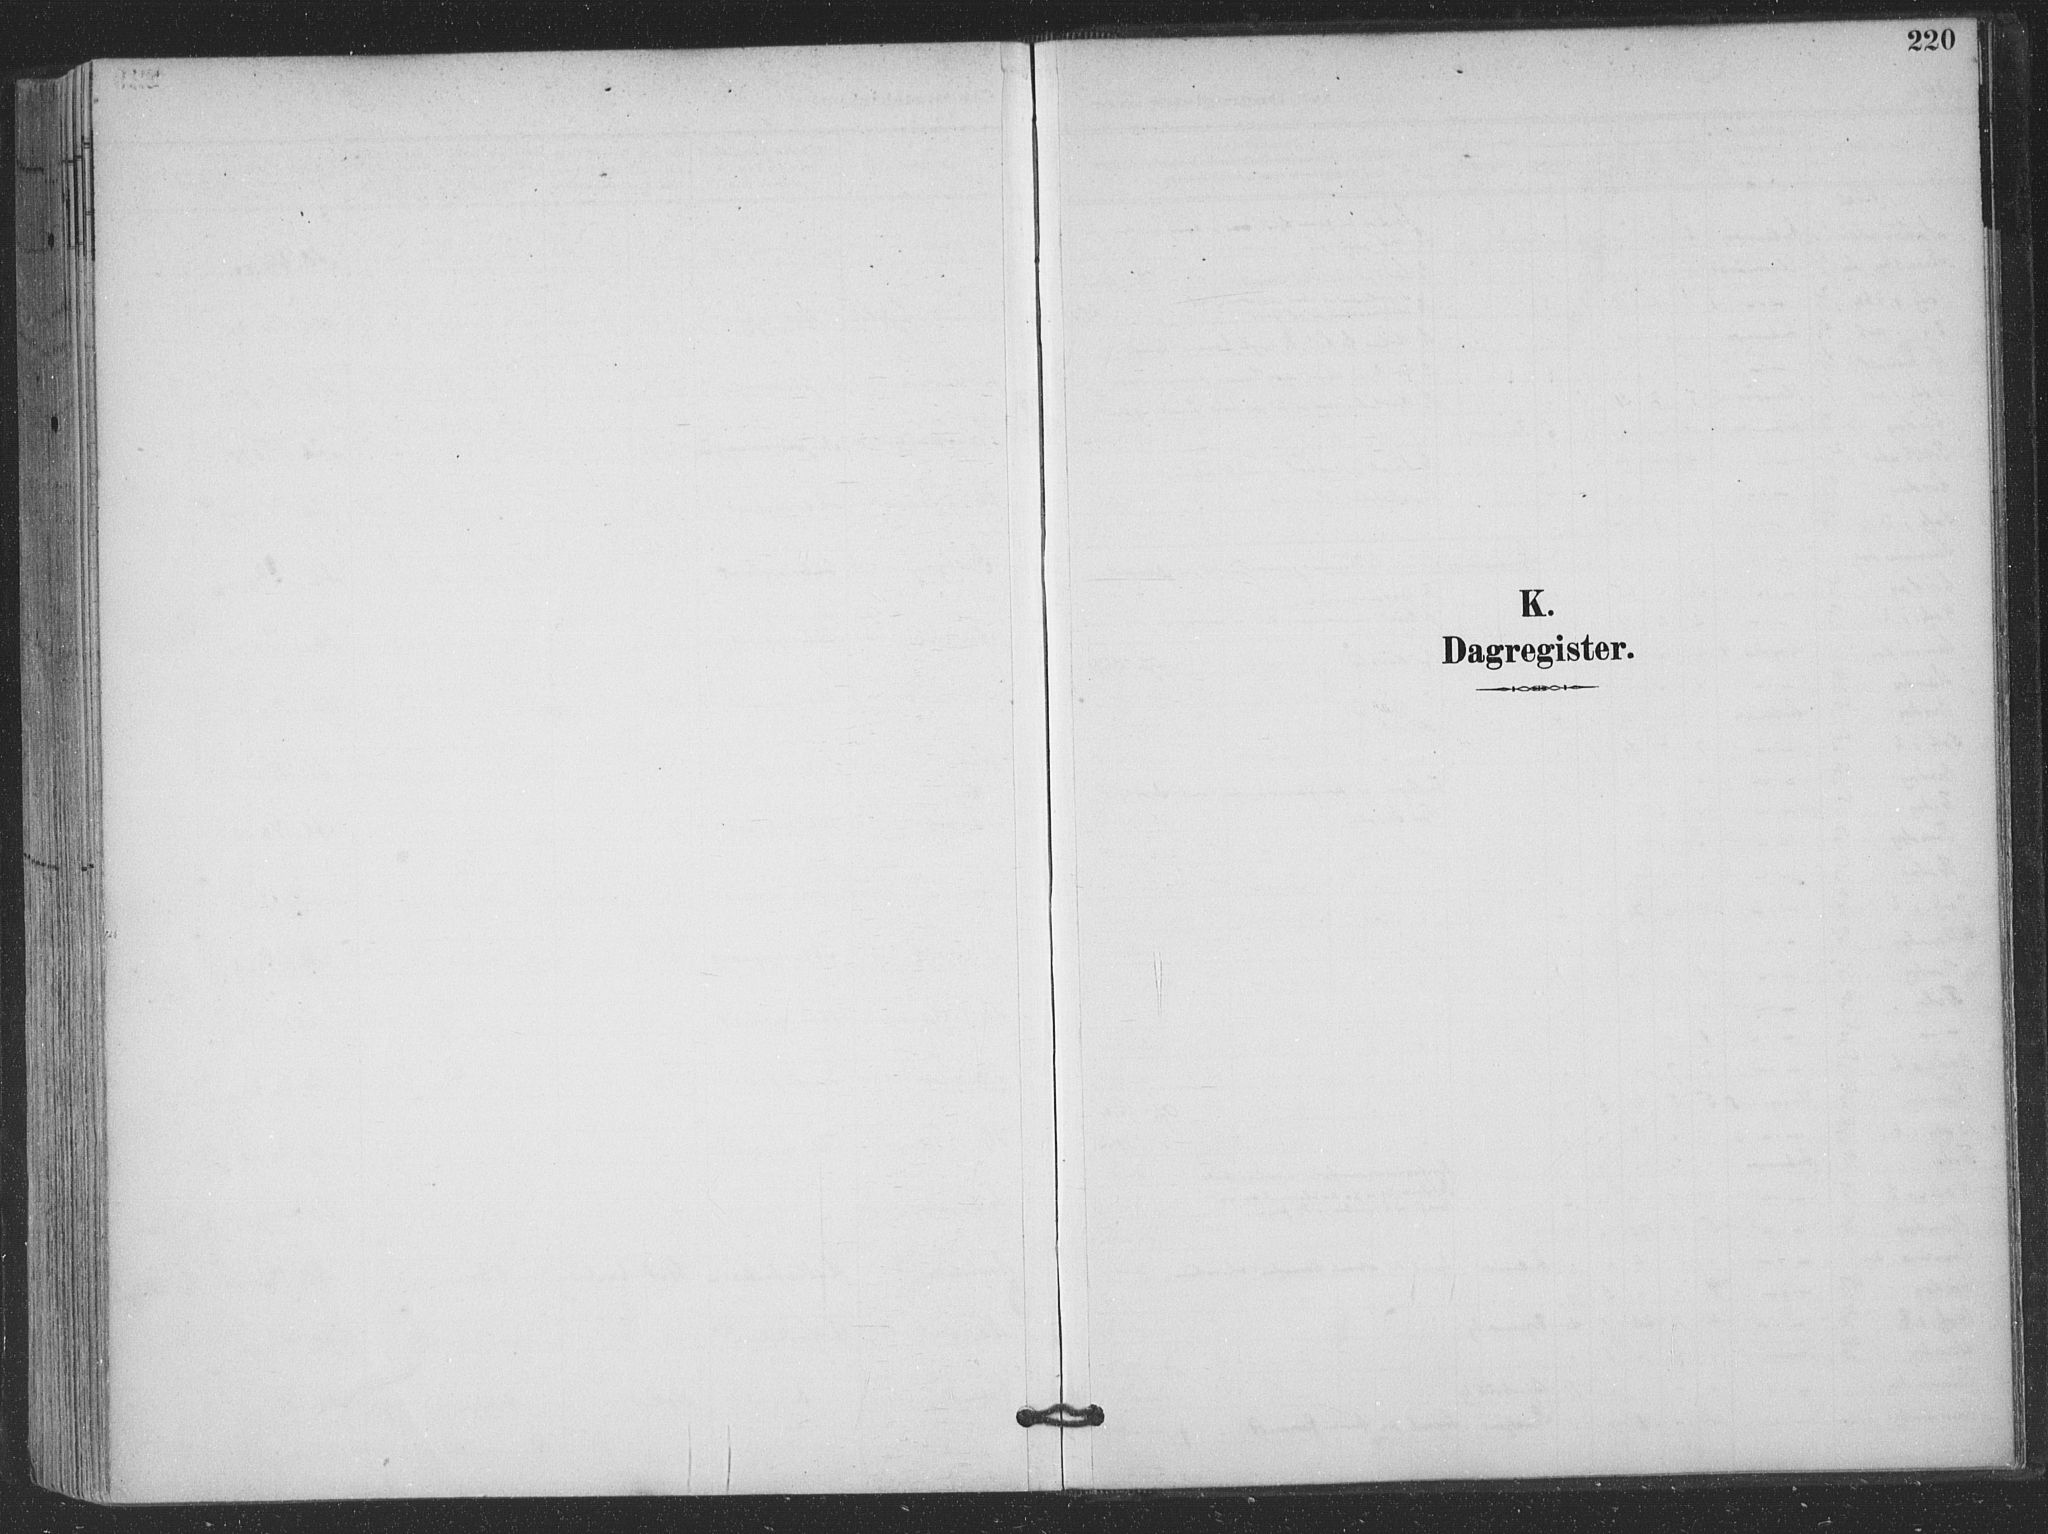 SAT, Ministerialprotokoller, klokkerbøker og fødselsregistre - Nordland, 866/L0939: Ministerialbok nr. 866A02, 1894-1906, s. 220